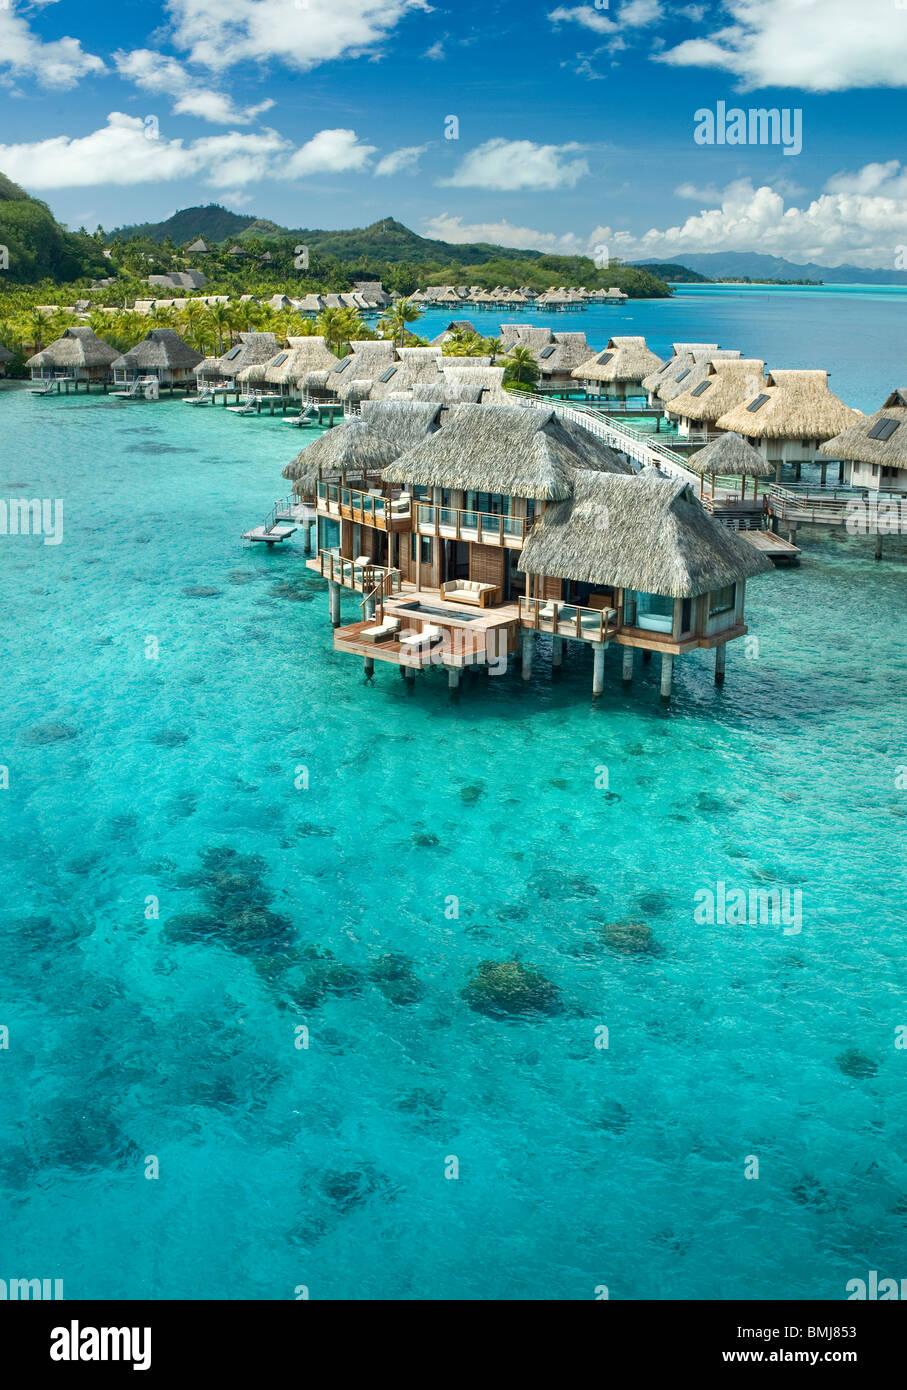 Overwater bungalows of Hilton bora Bora Nui Resort  hotel in Bora bora Island - Stock Image